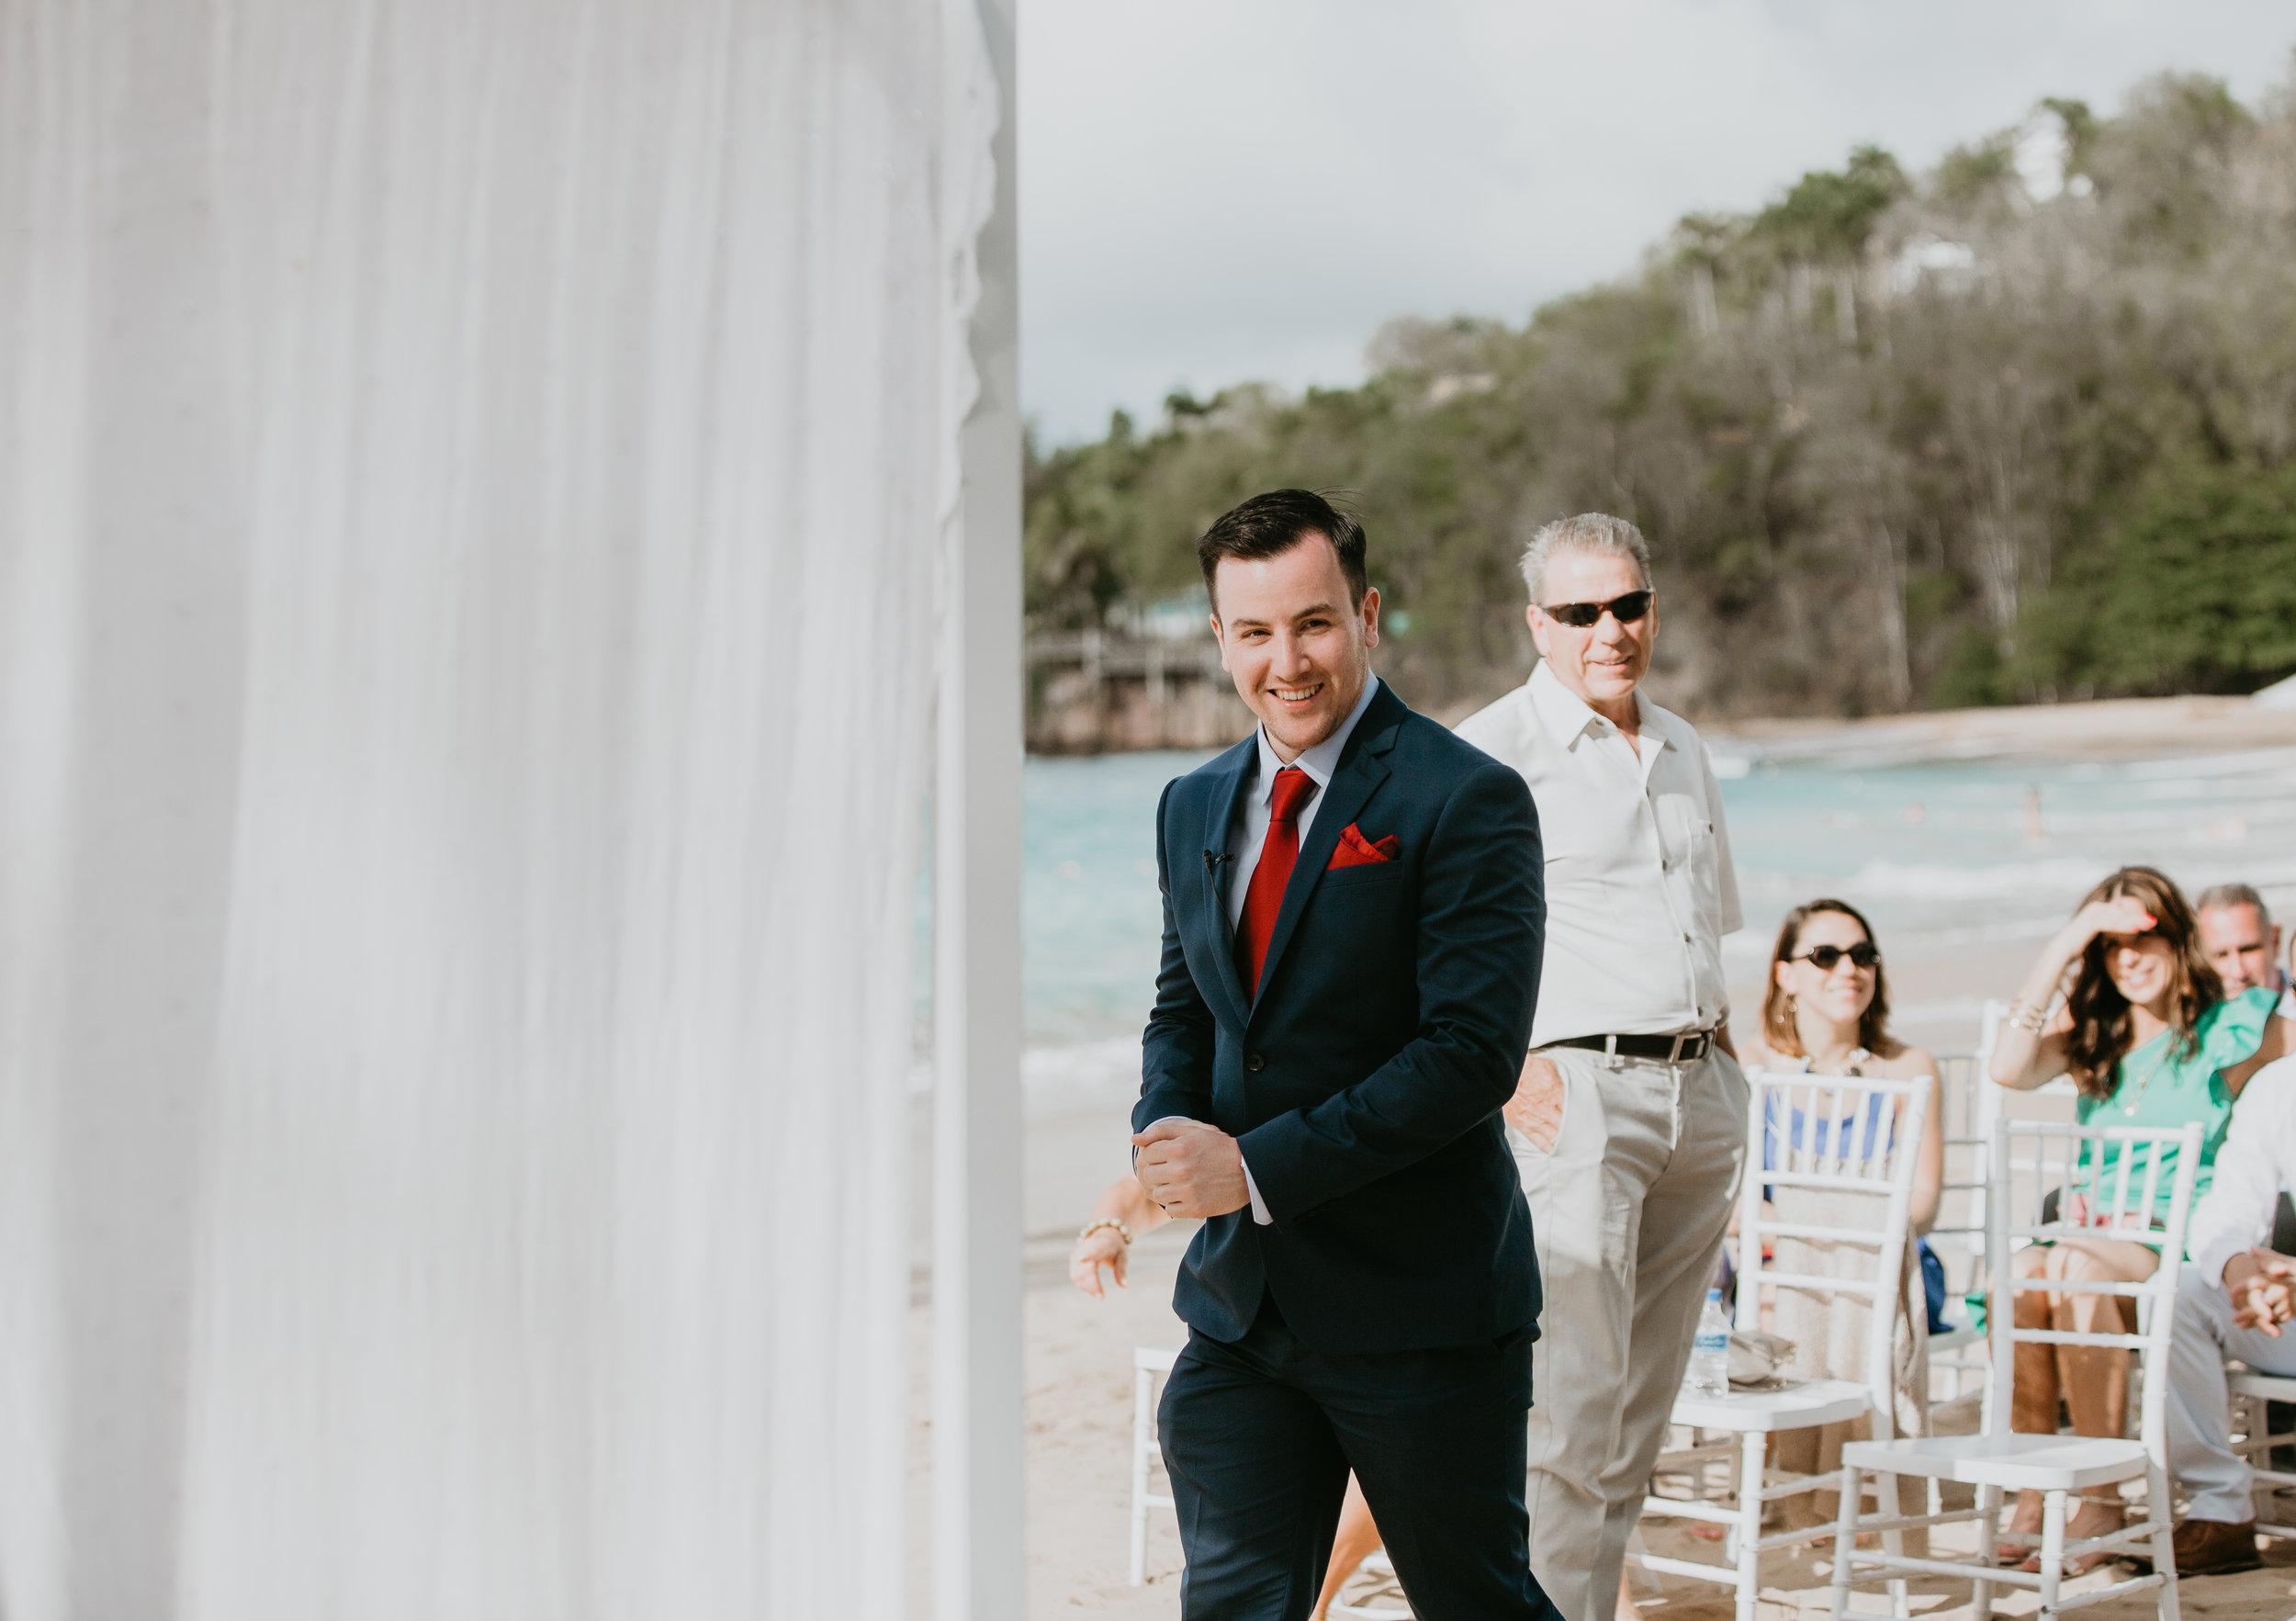 nicole-daacke-photography-destination-wedding-in-st-lucia-sandals-la-toc-intimate-island-wedding-carribean-elopement-photographer-chill-island-wedding-51.jpg